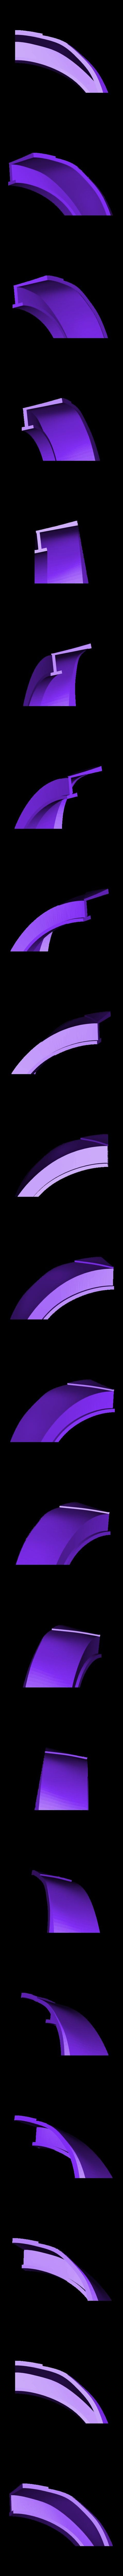 Part 18 v1.stl Download STL file ARF Trooper Helmet • 3D print object, VillainousPropShop